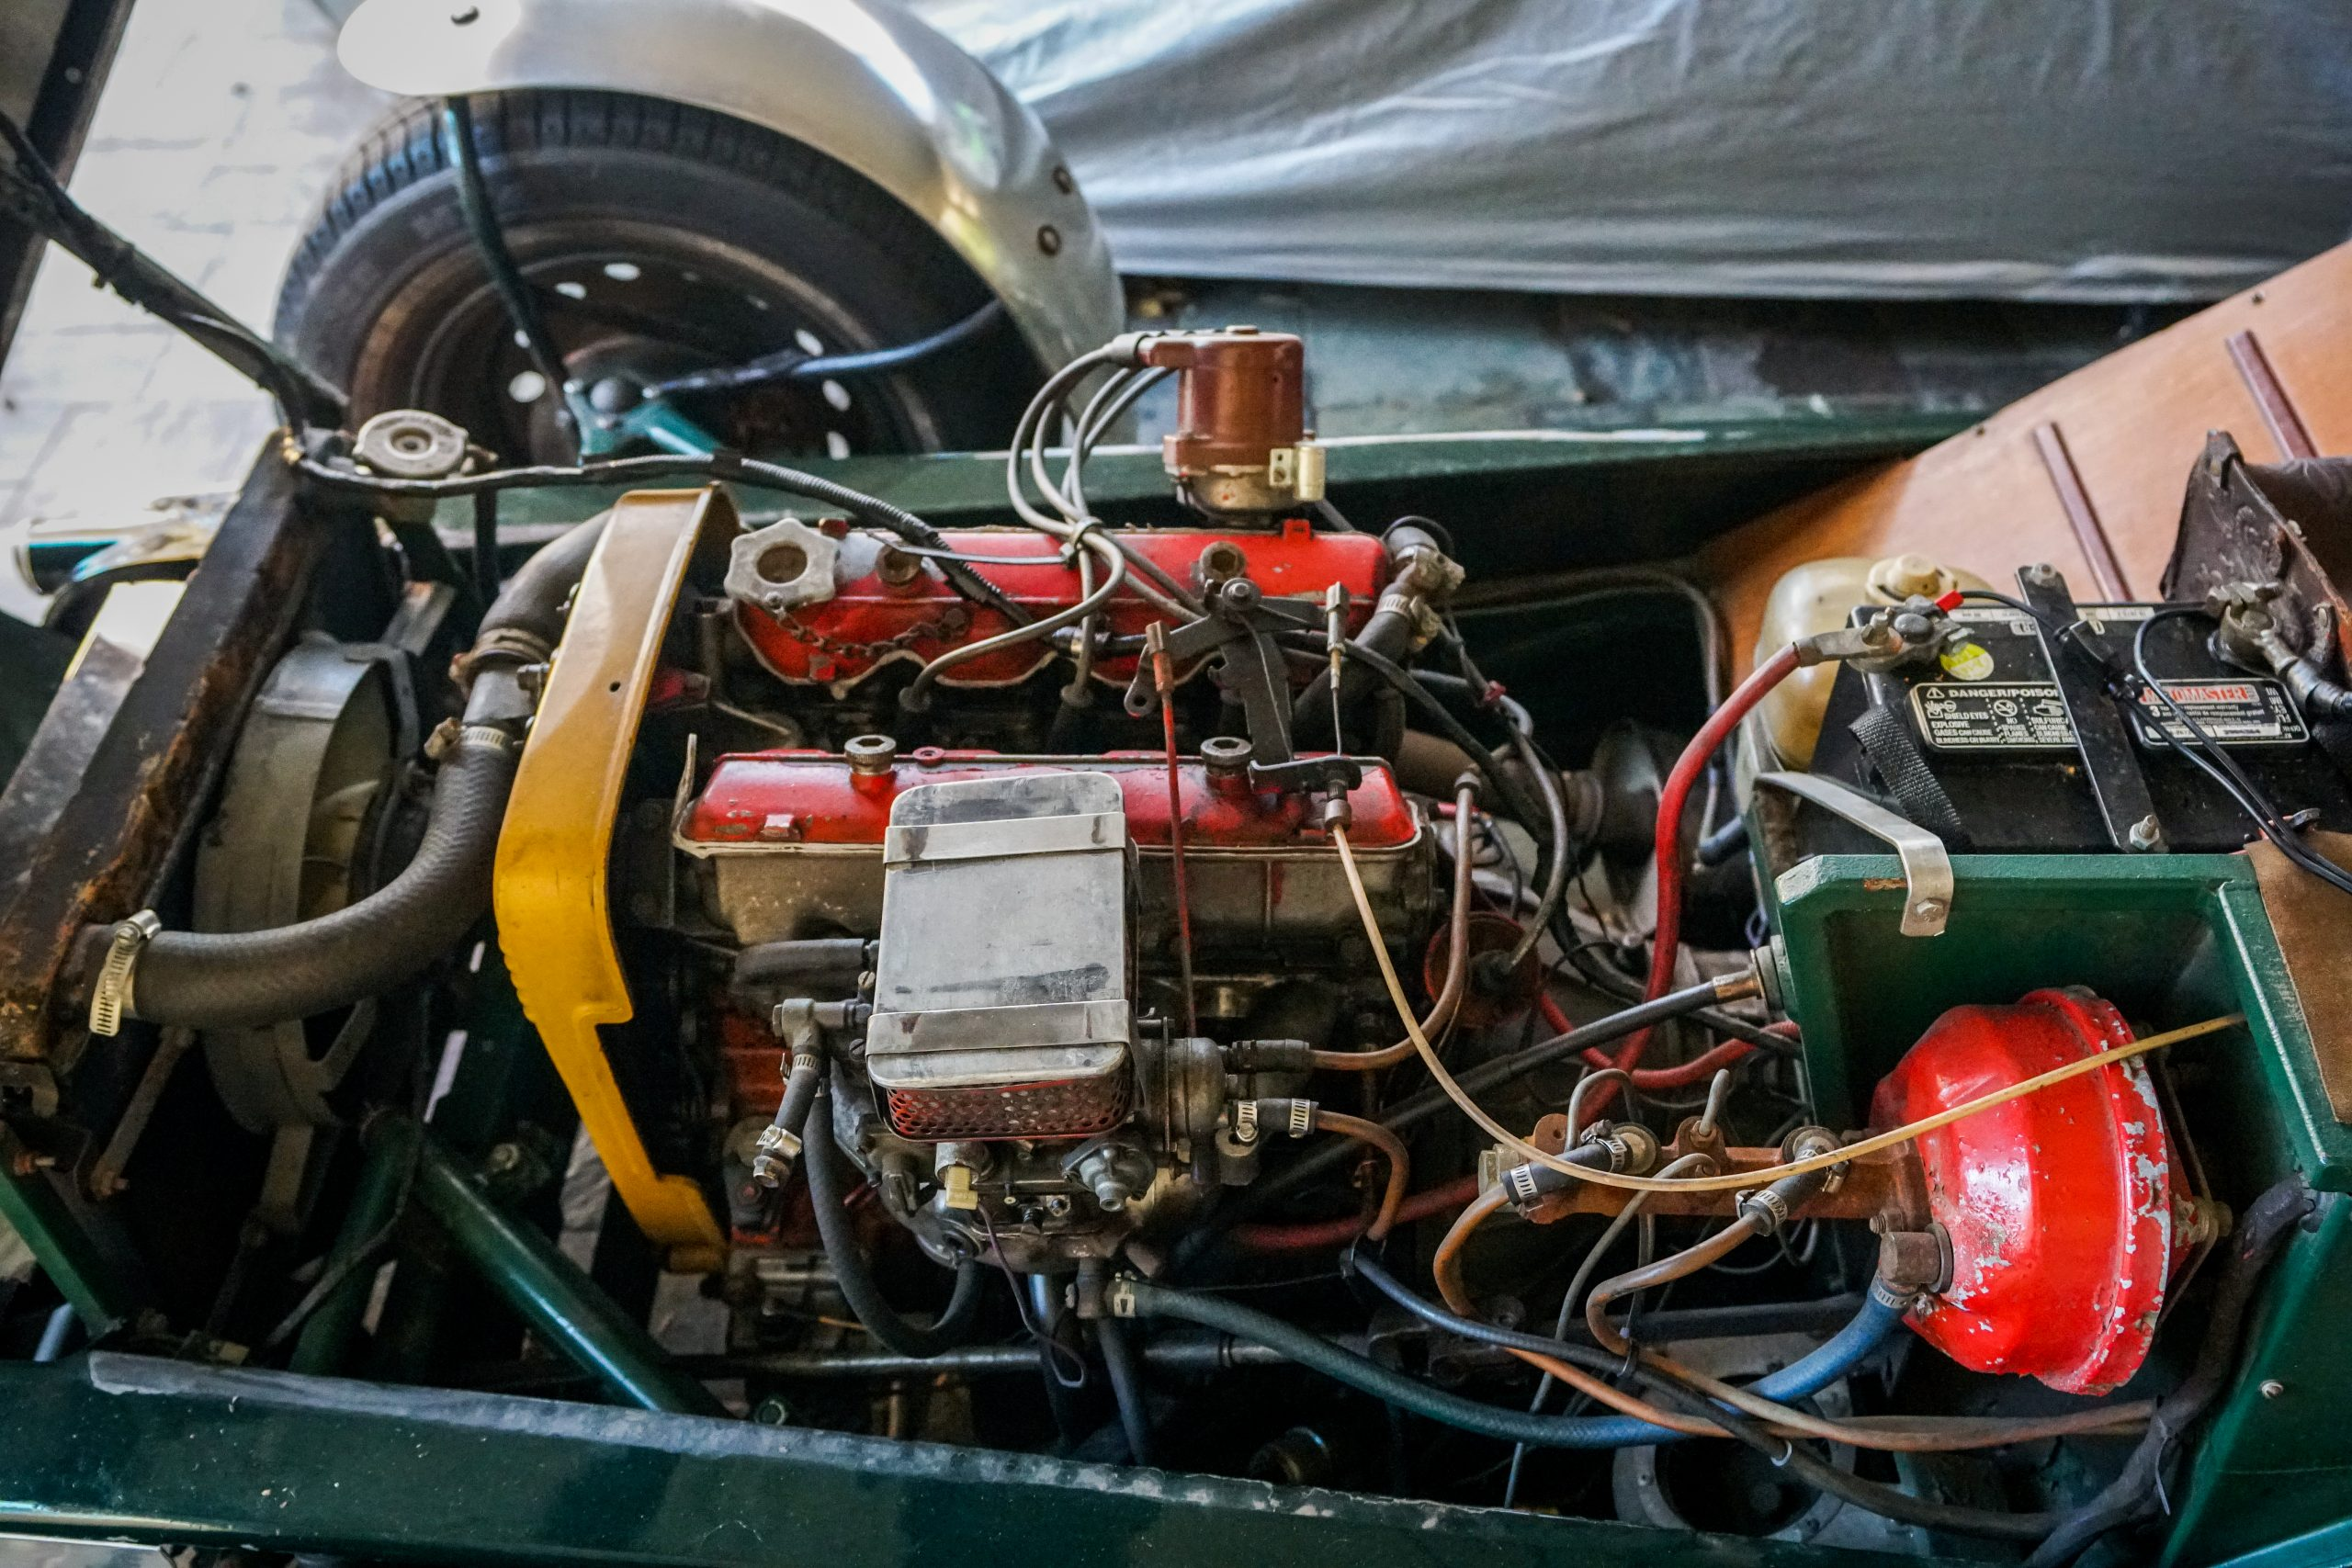 Toly Arutunoff Michel Pistol bespoke Fiat engine